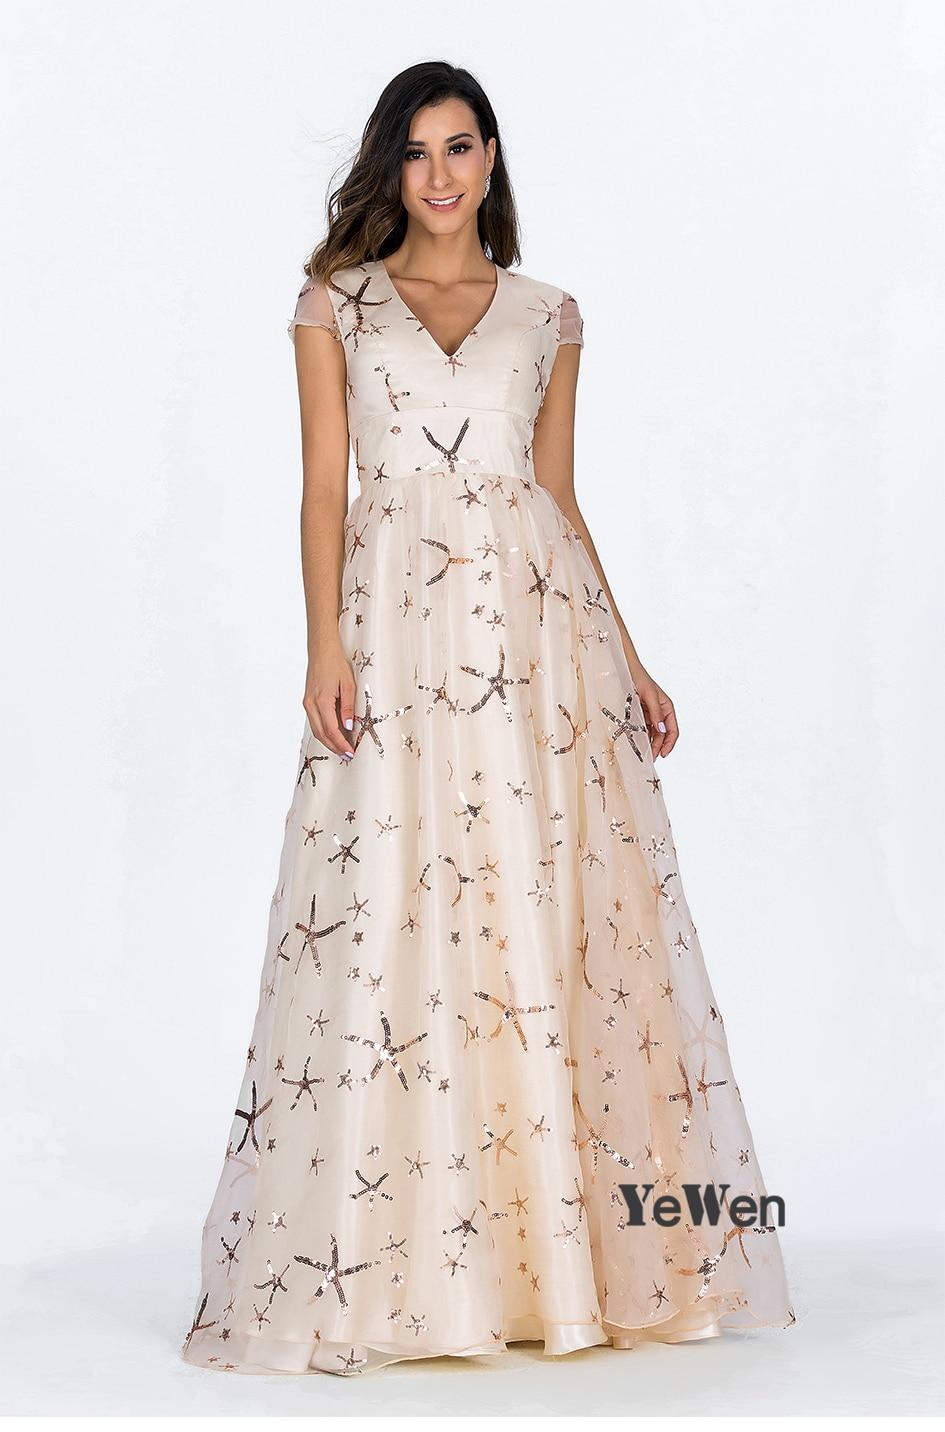 95d5bcacab6fe US $161.49 15% OFF Stars Silk satin Short Sleeve Evening Dresses Long 2018  abendkleider Party gala dress elegant Prom evening gown Robe Soiree -in ...